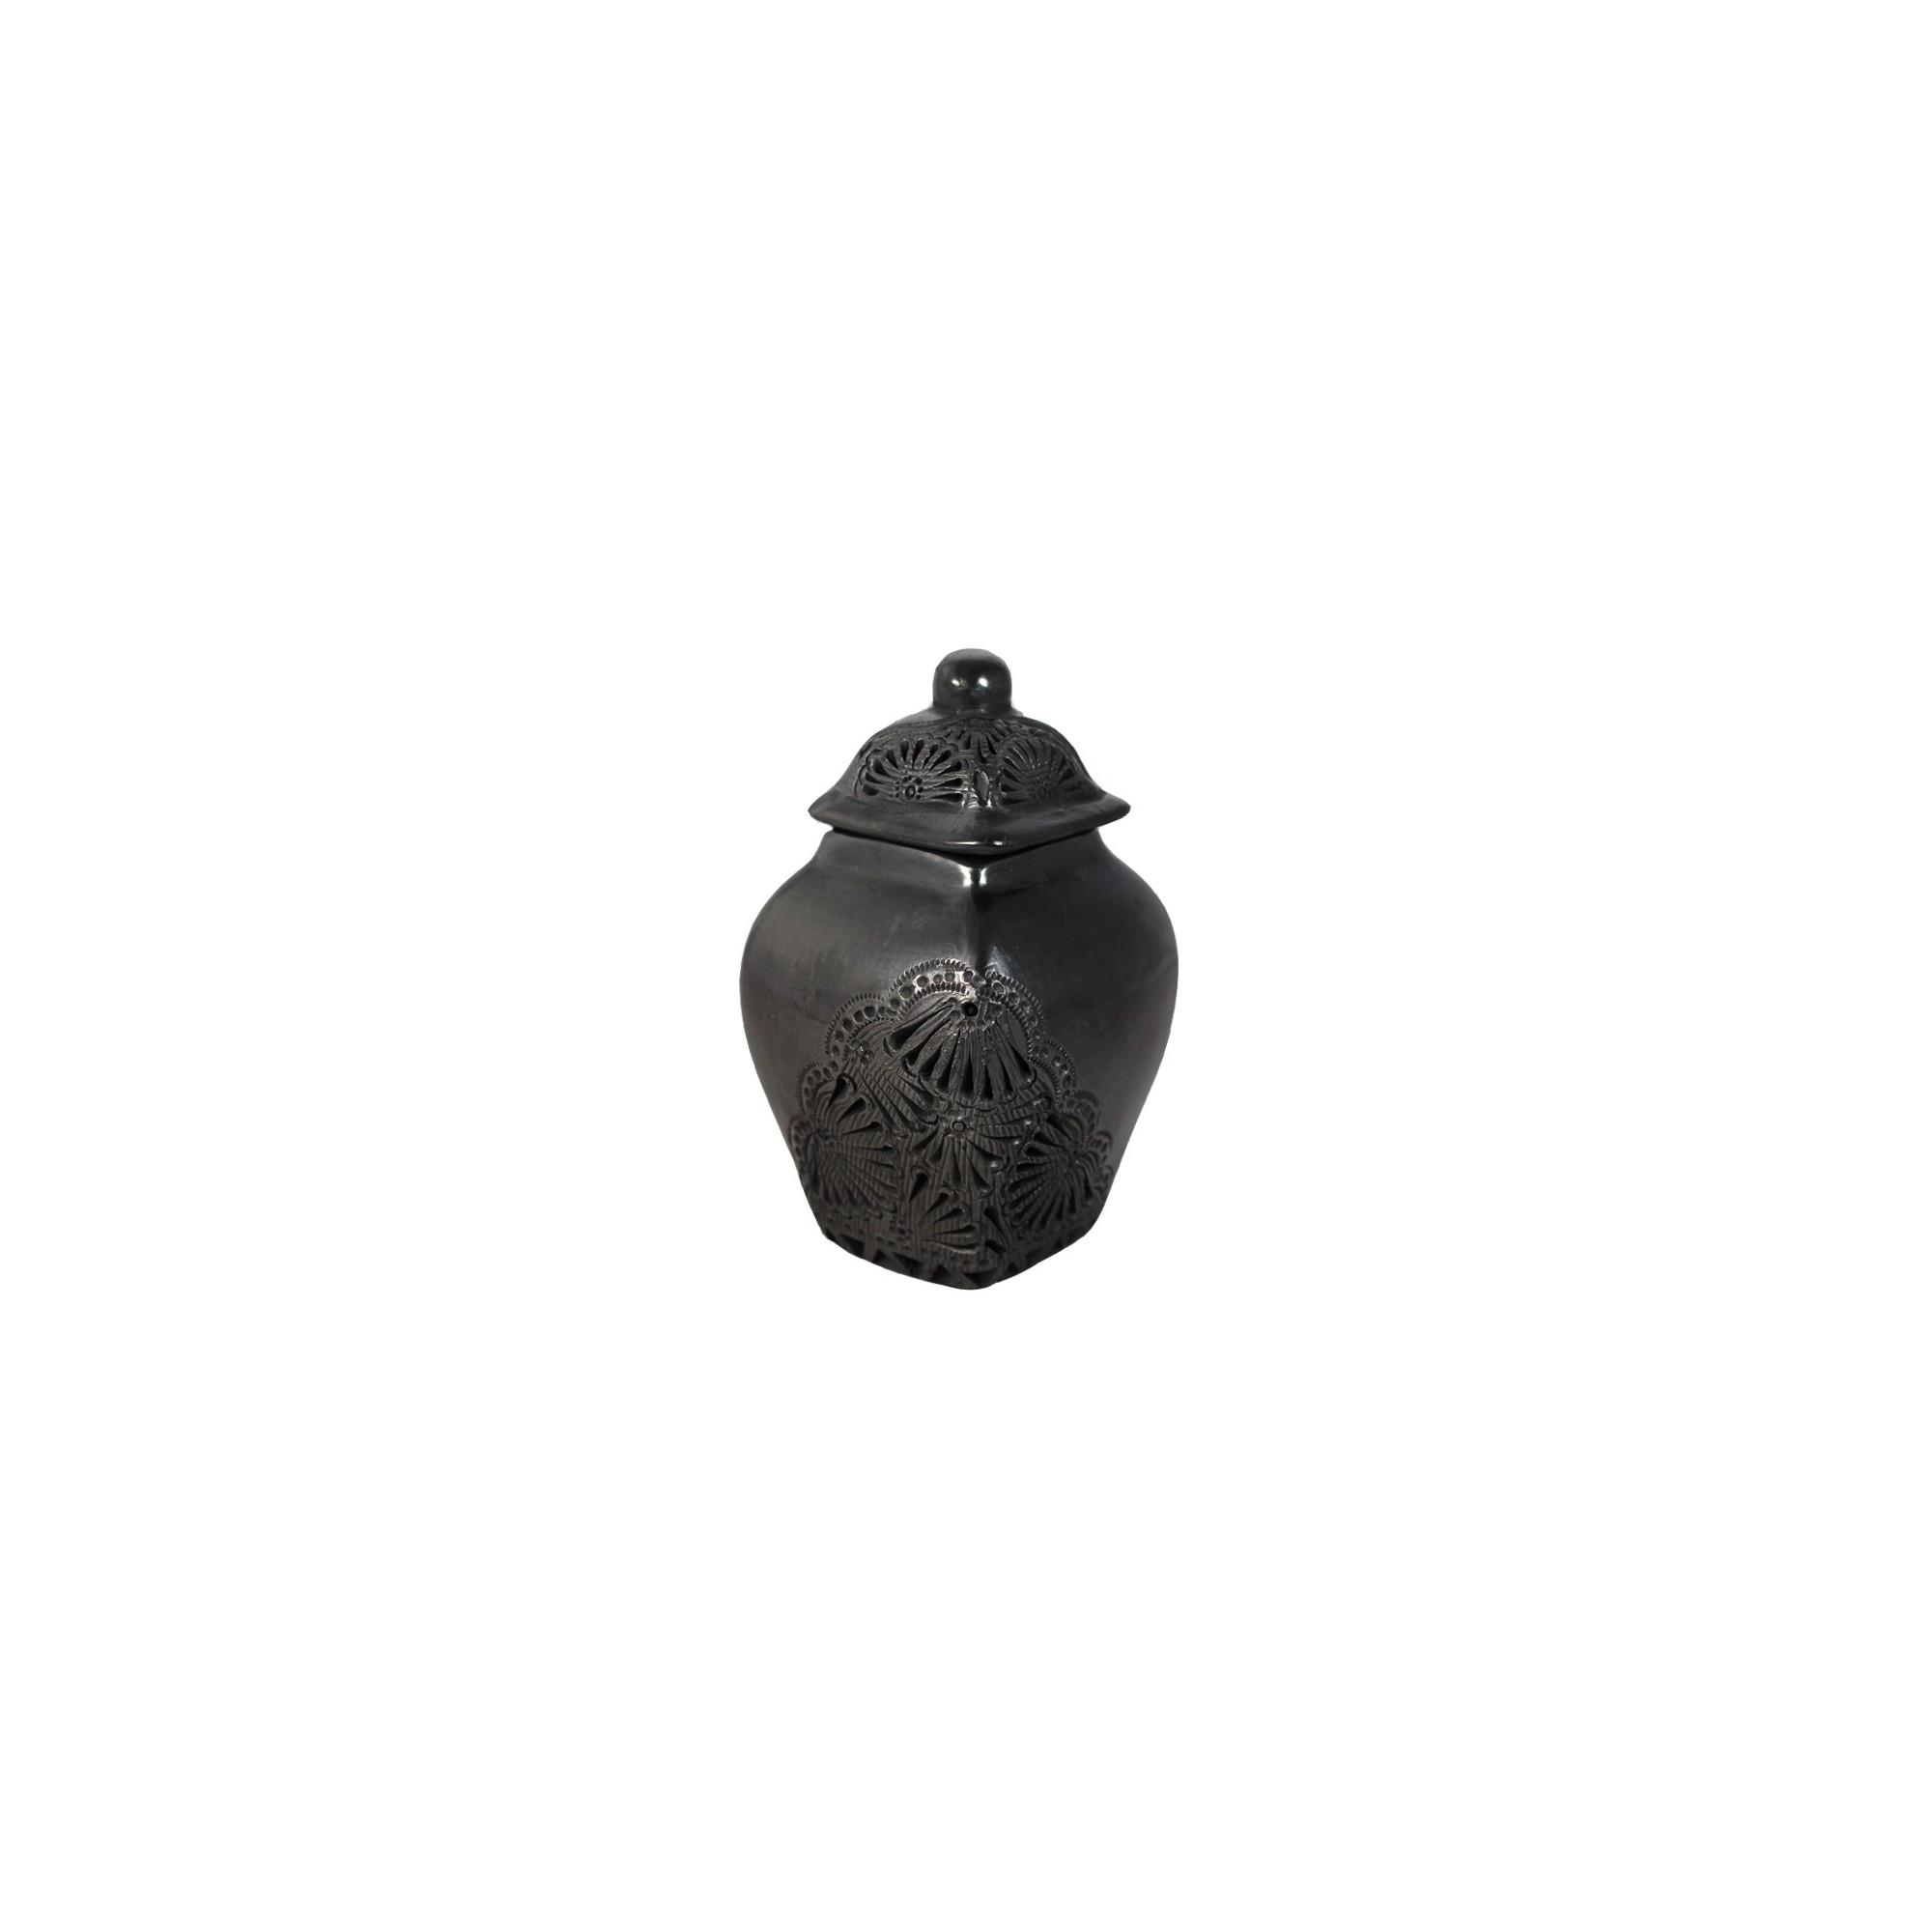 schwarze deko vase mit deckel schwarze keramik quot bonito quot kaufen